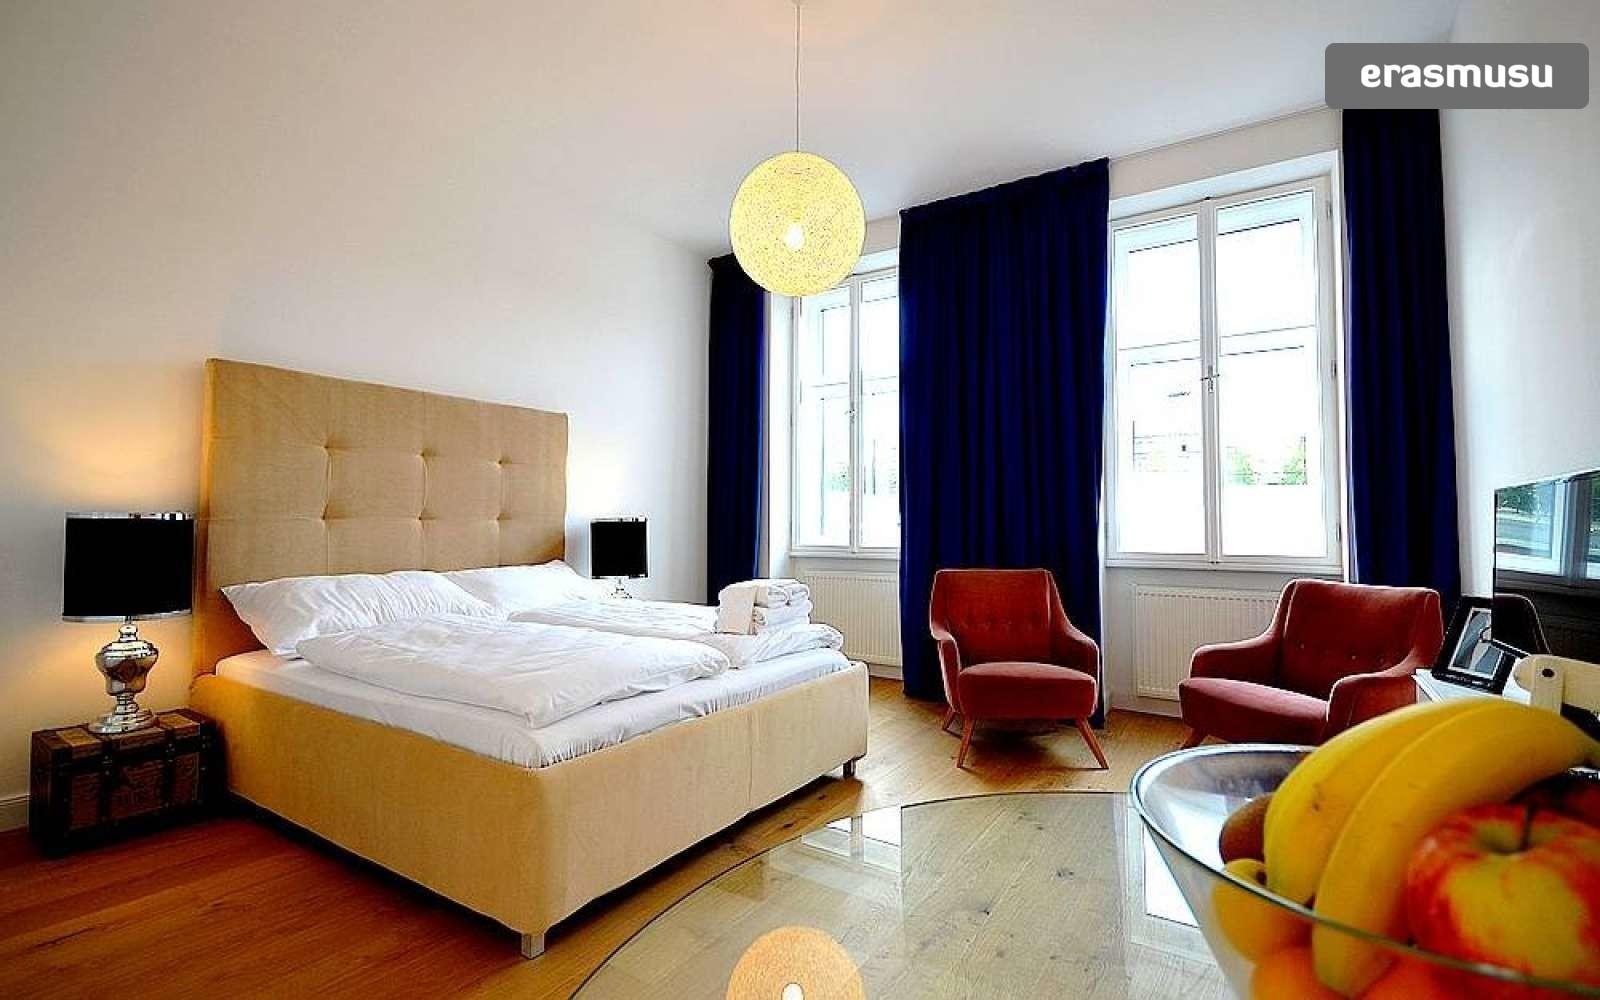 studio-apartment-rent-rudolfsheim-funfhaus-b42c4fe6b98bd02aa24f7